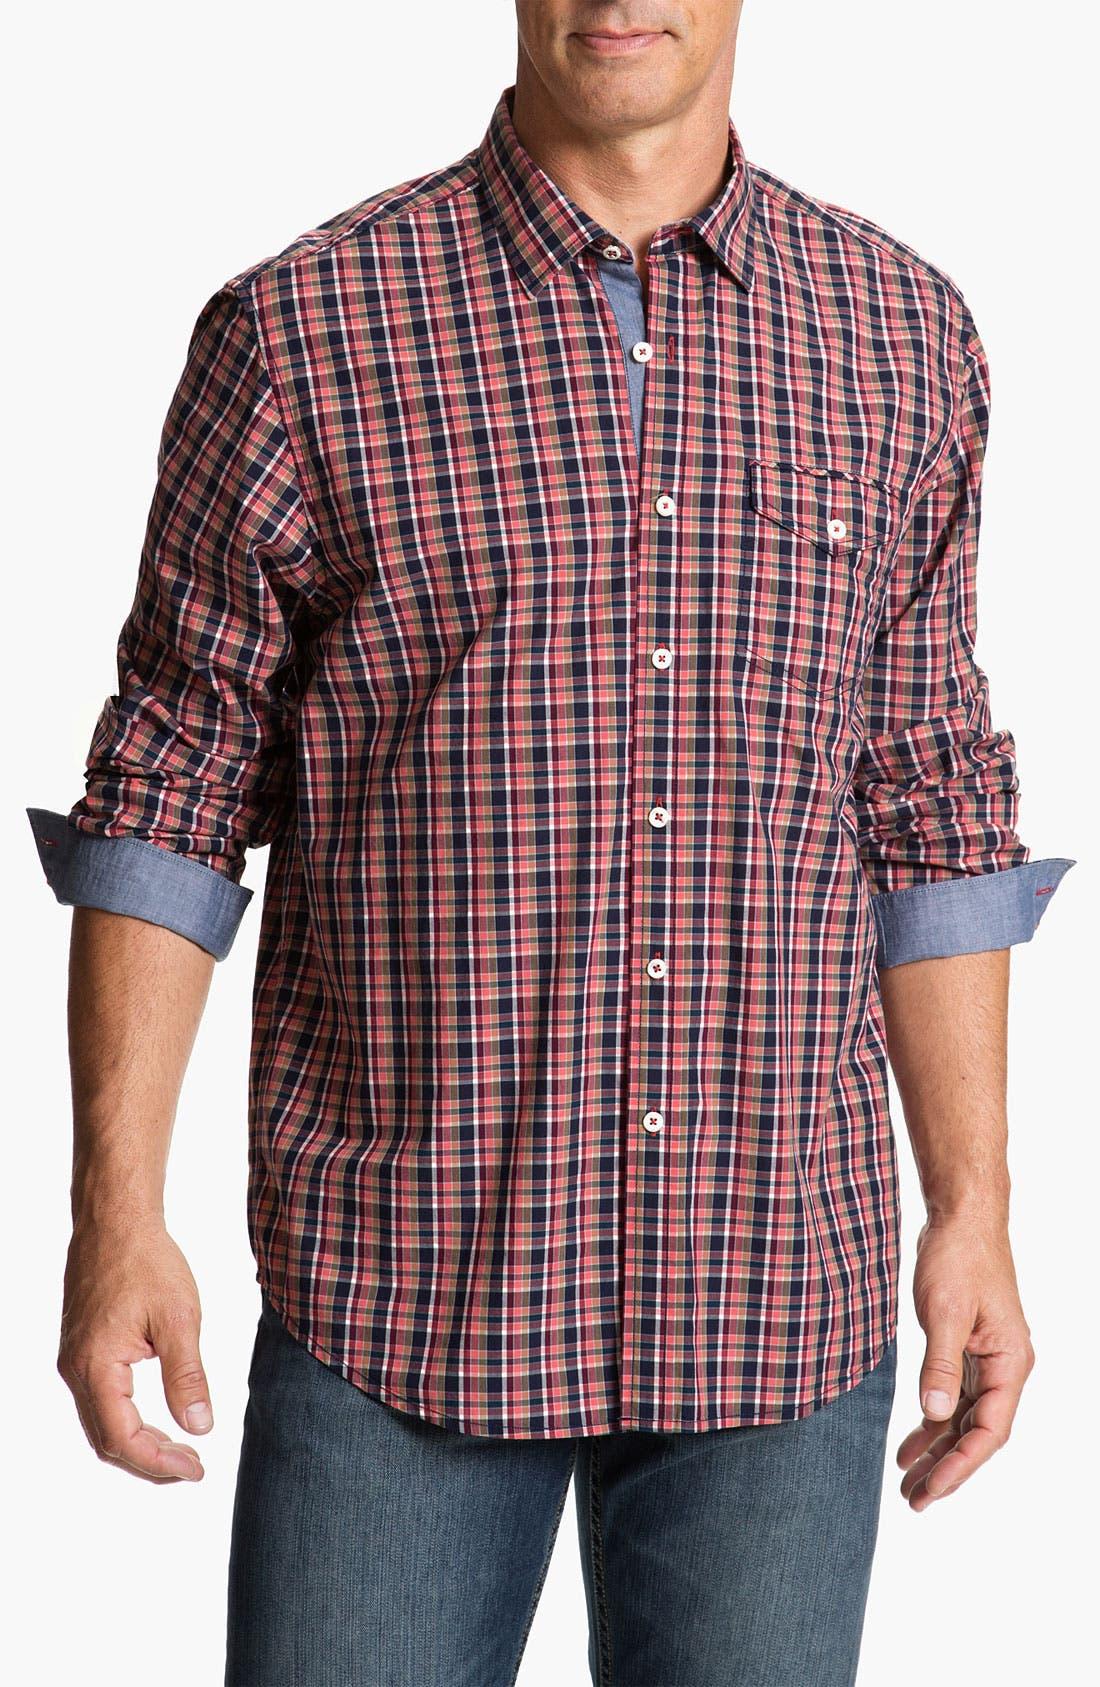 Alternate Image 1 Selected - Tommy Bahama Denim 'Bao Down Plaid' Sport Shirt